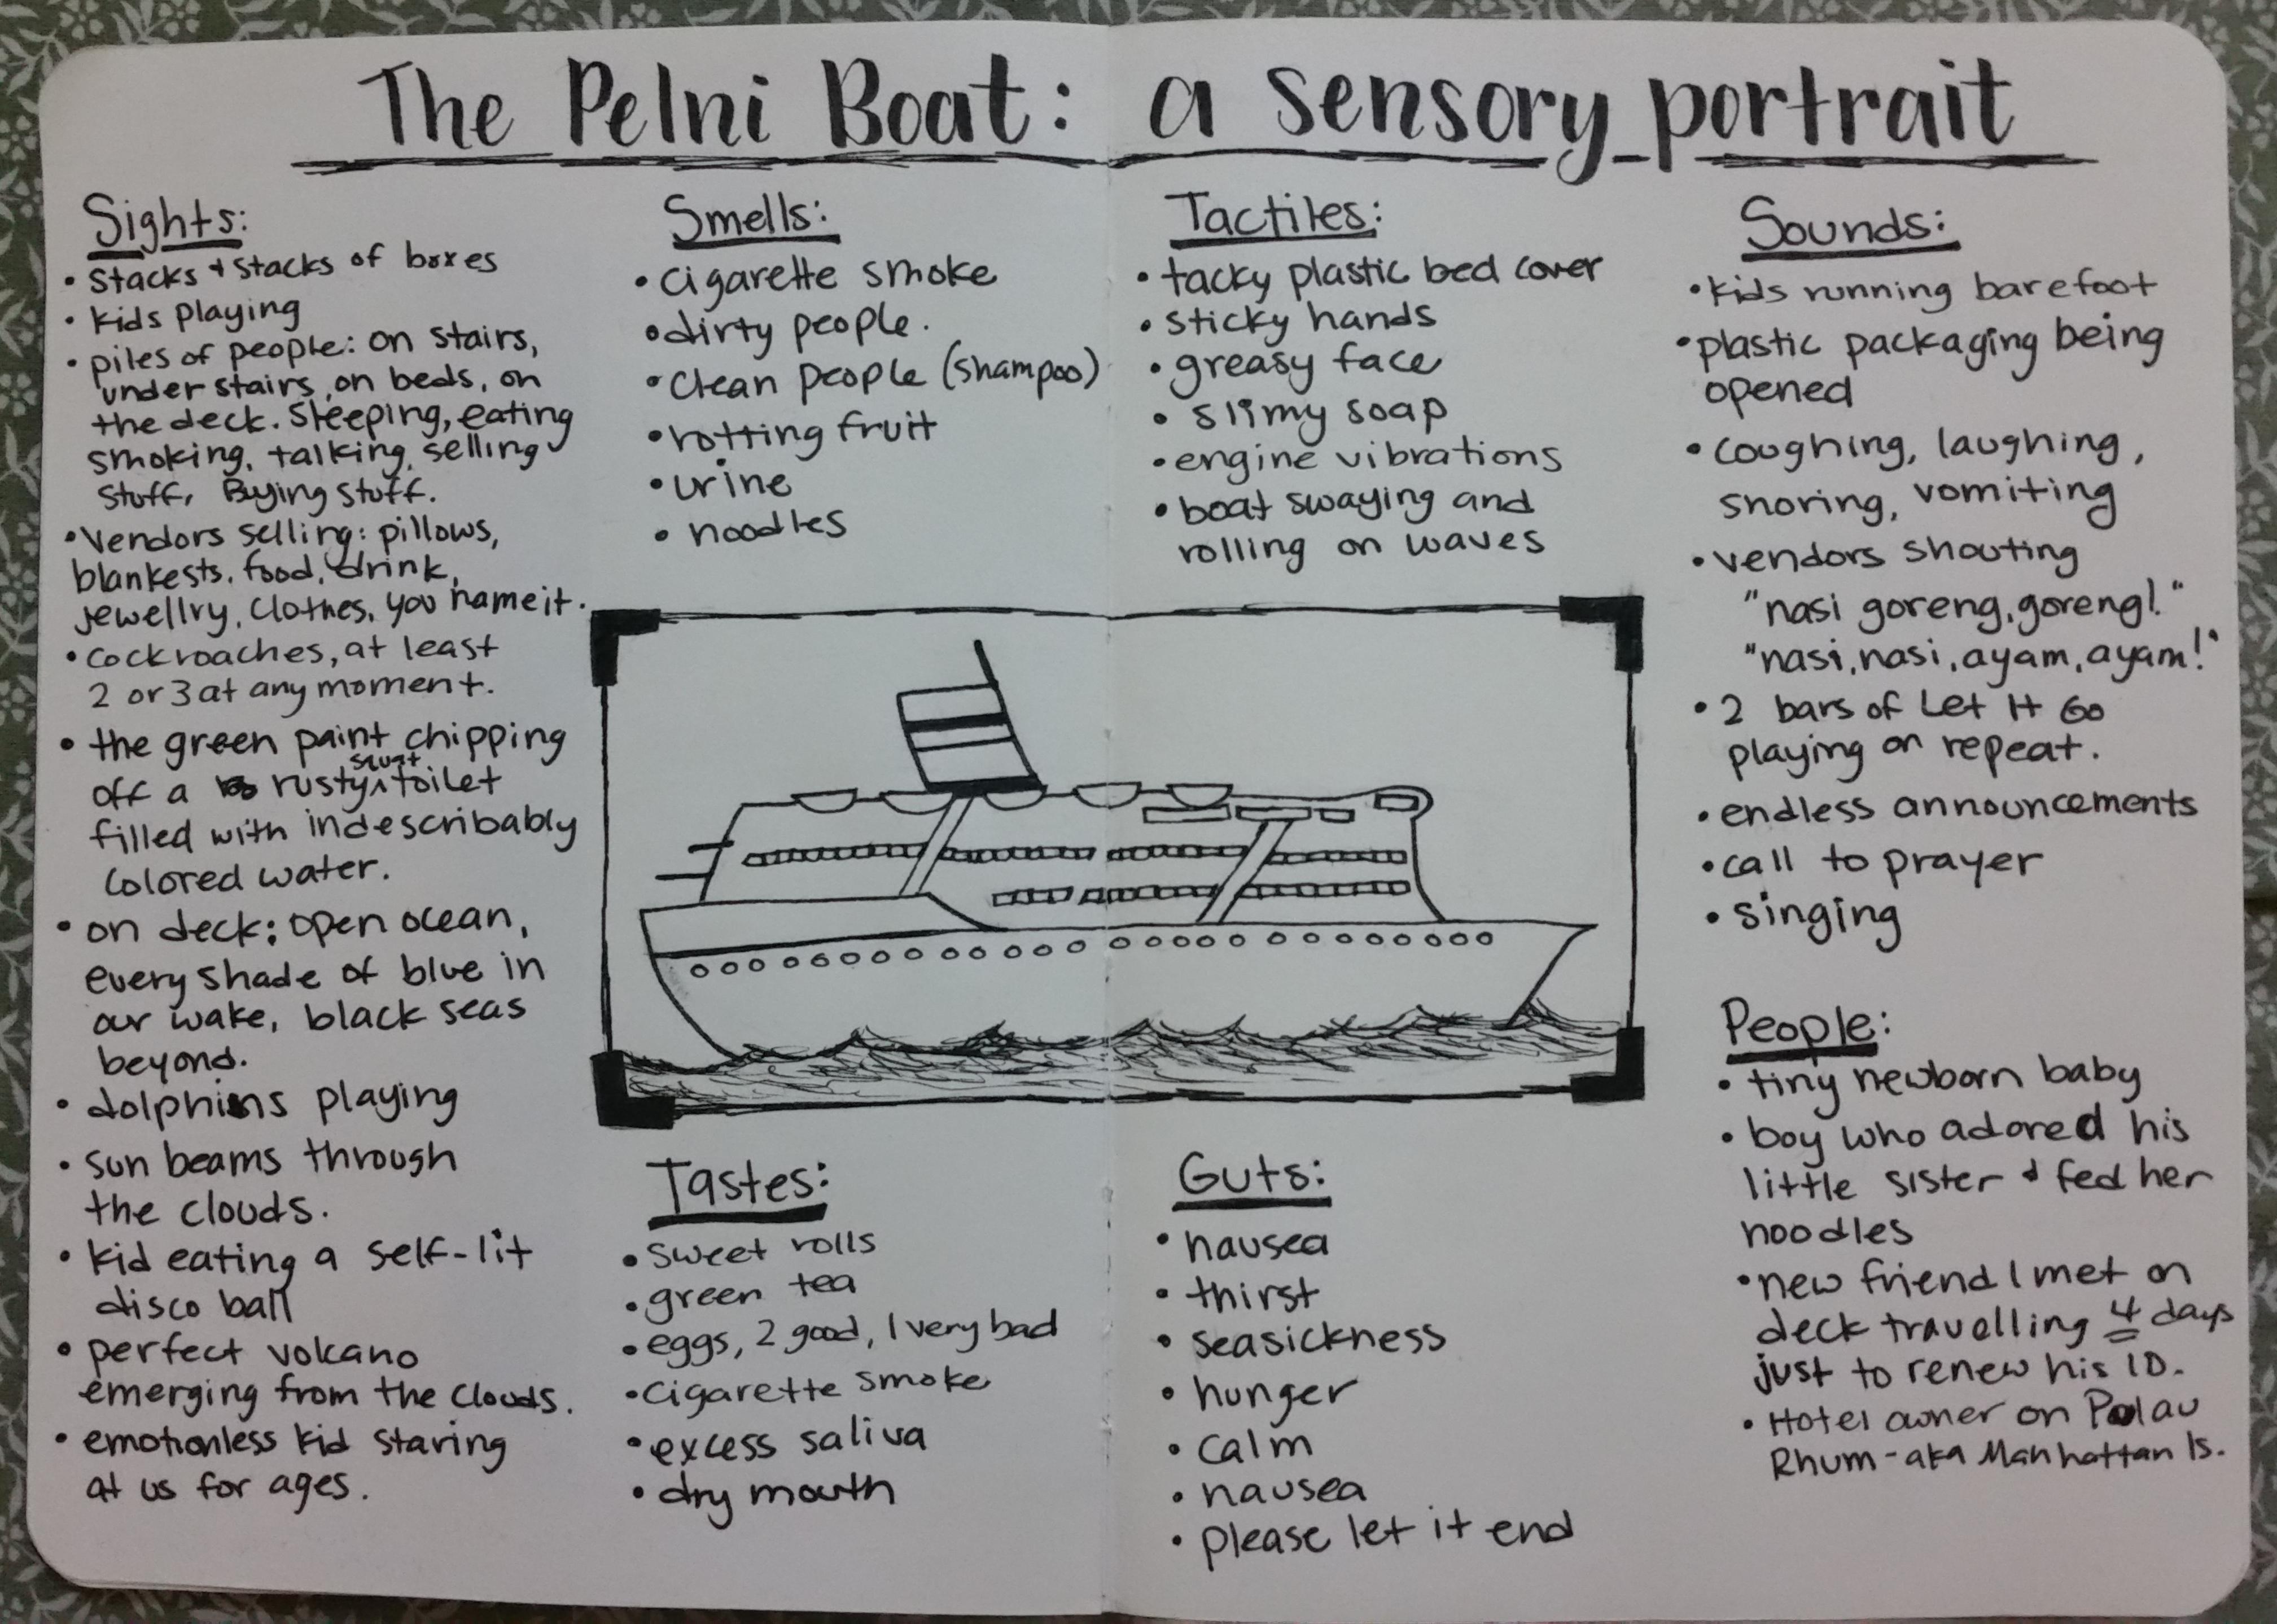 Pelni Boat